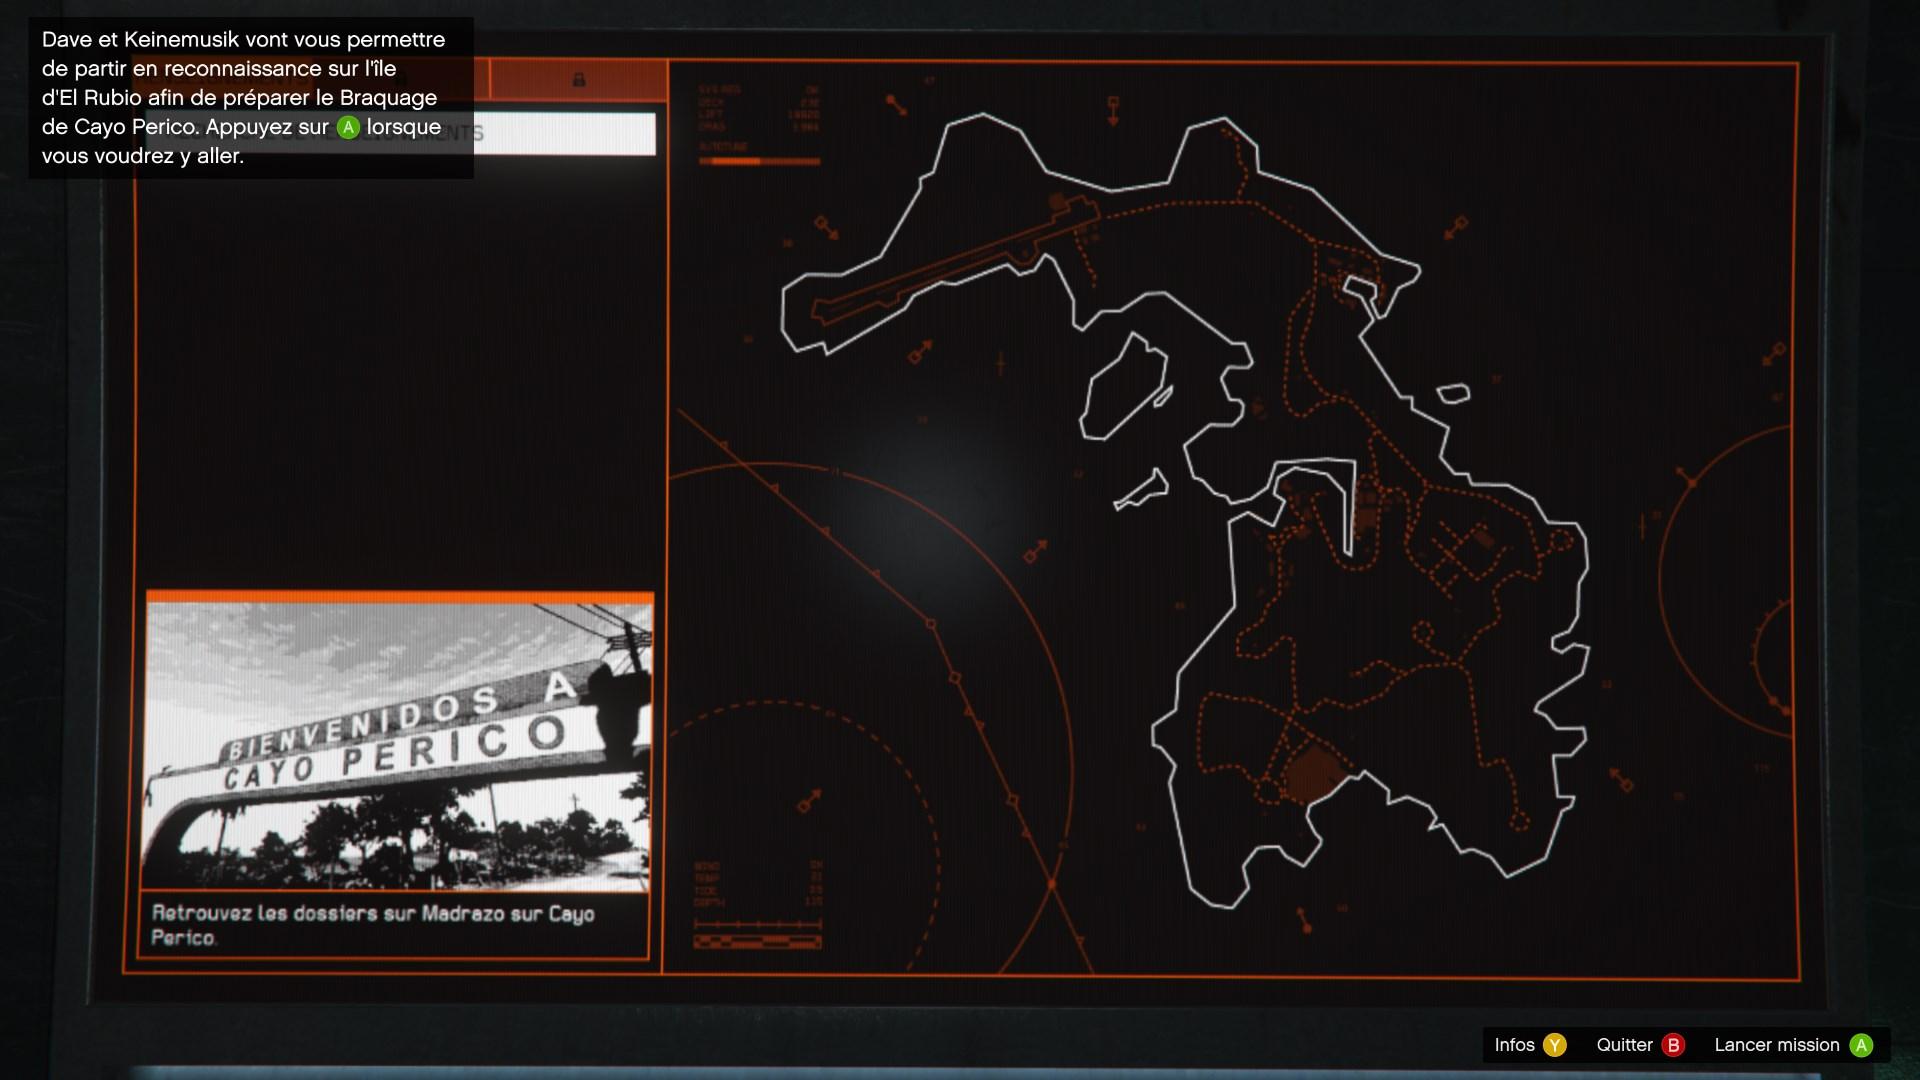 carte-nouvelle-ile-cayo-perico-map-gta-5-online